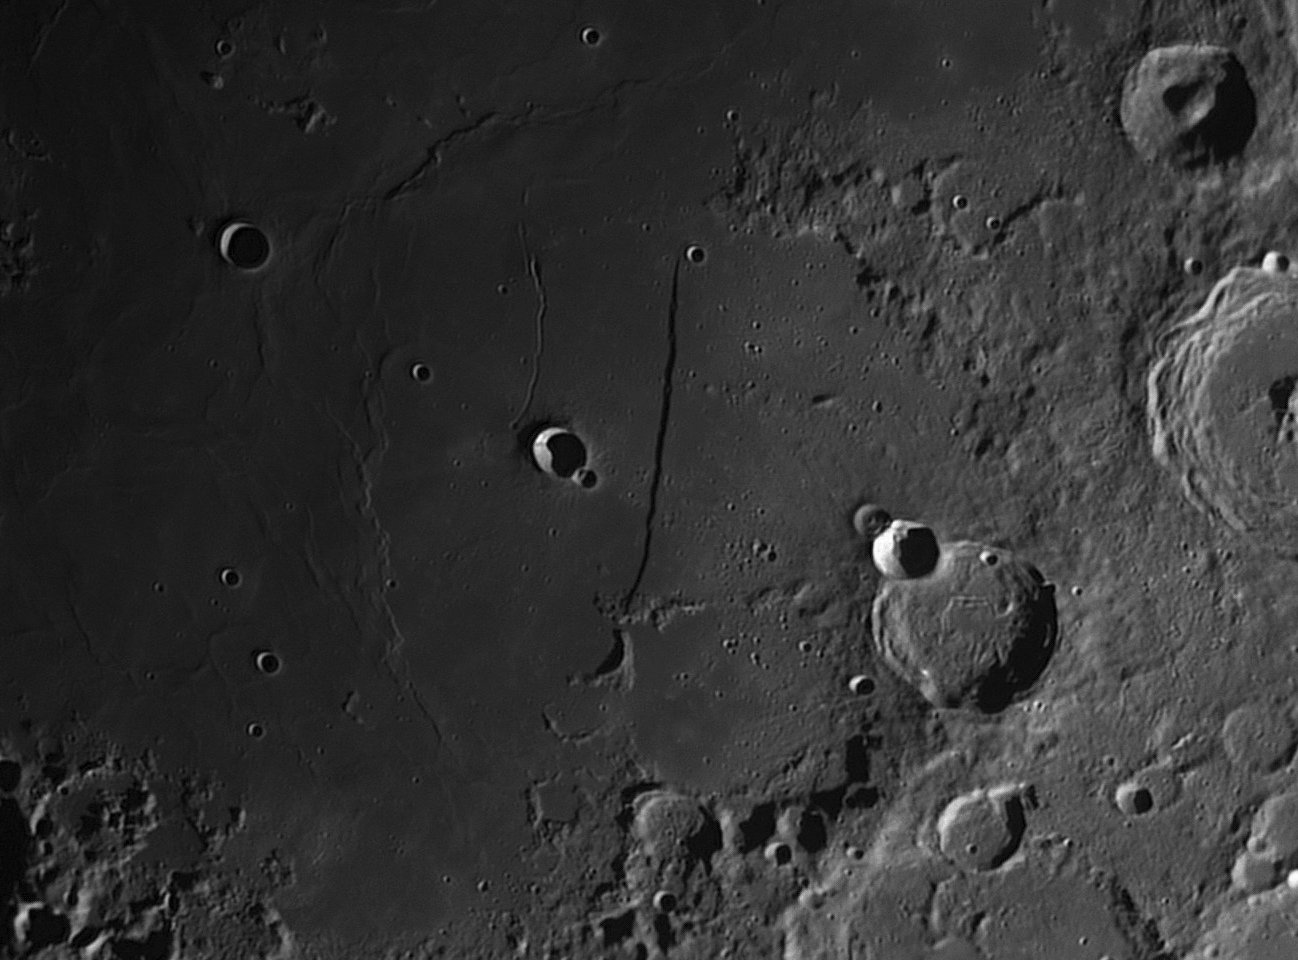 Moon_201606_lapl4_ap311 Mur droit.jpg